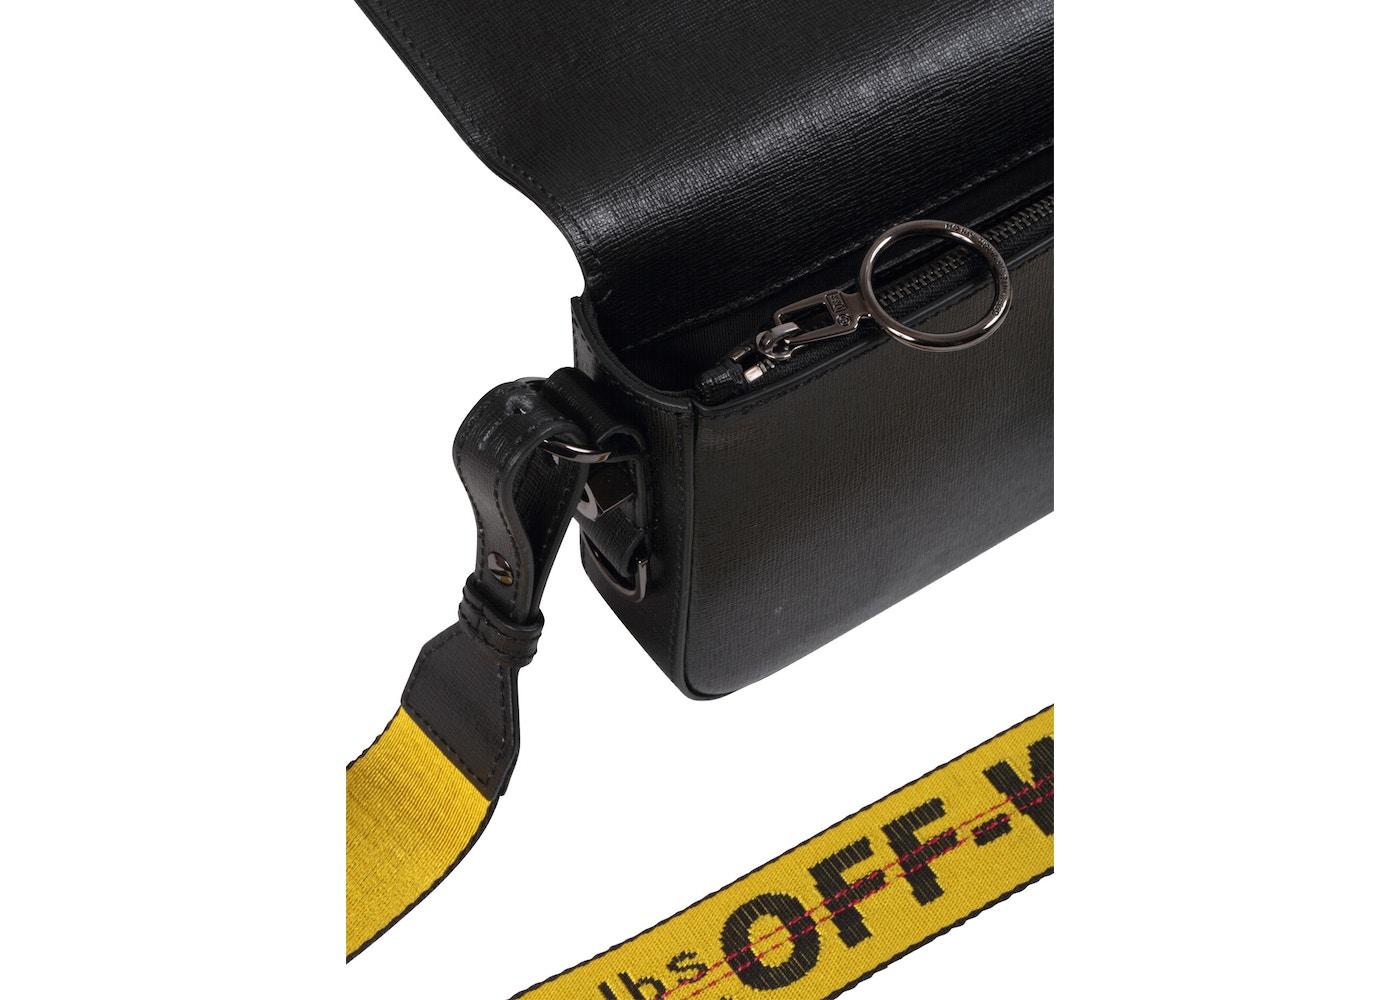 c101b9b3 OFF-WHITE Binder Clip Bag Diag Mini Black White Yellow